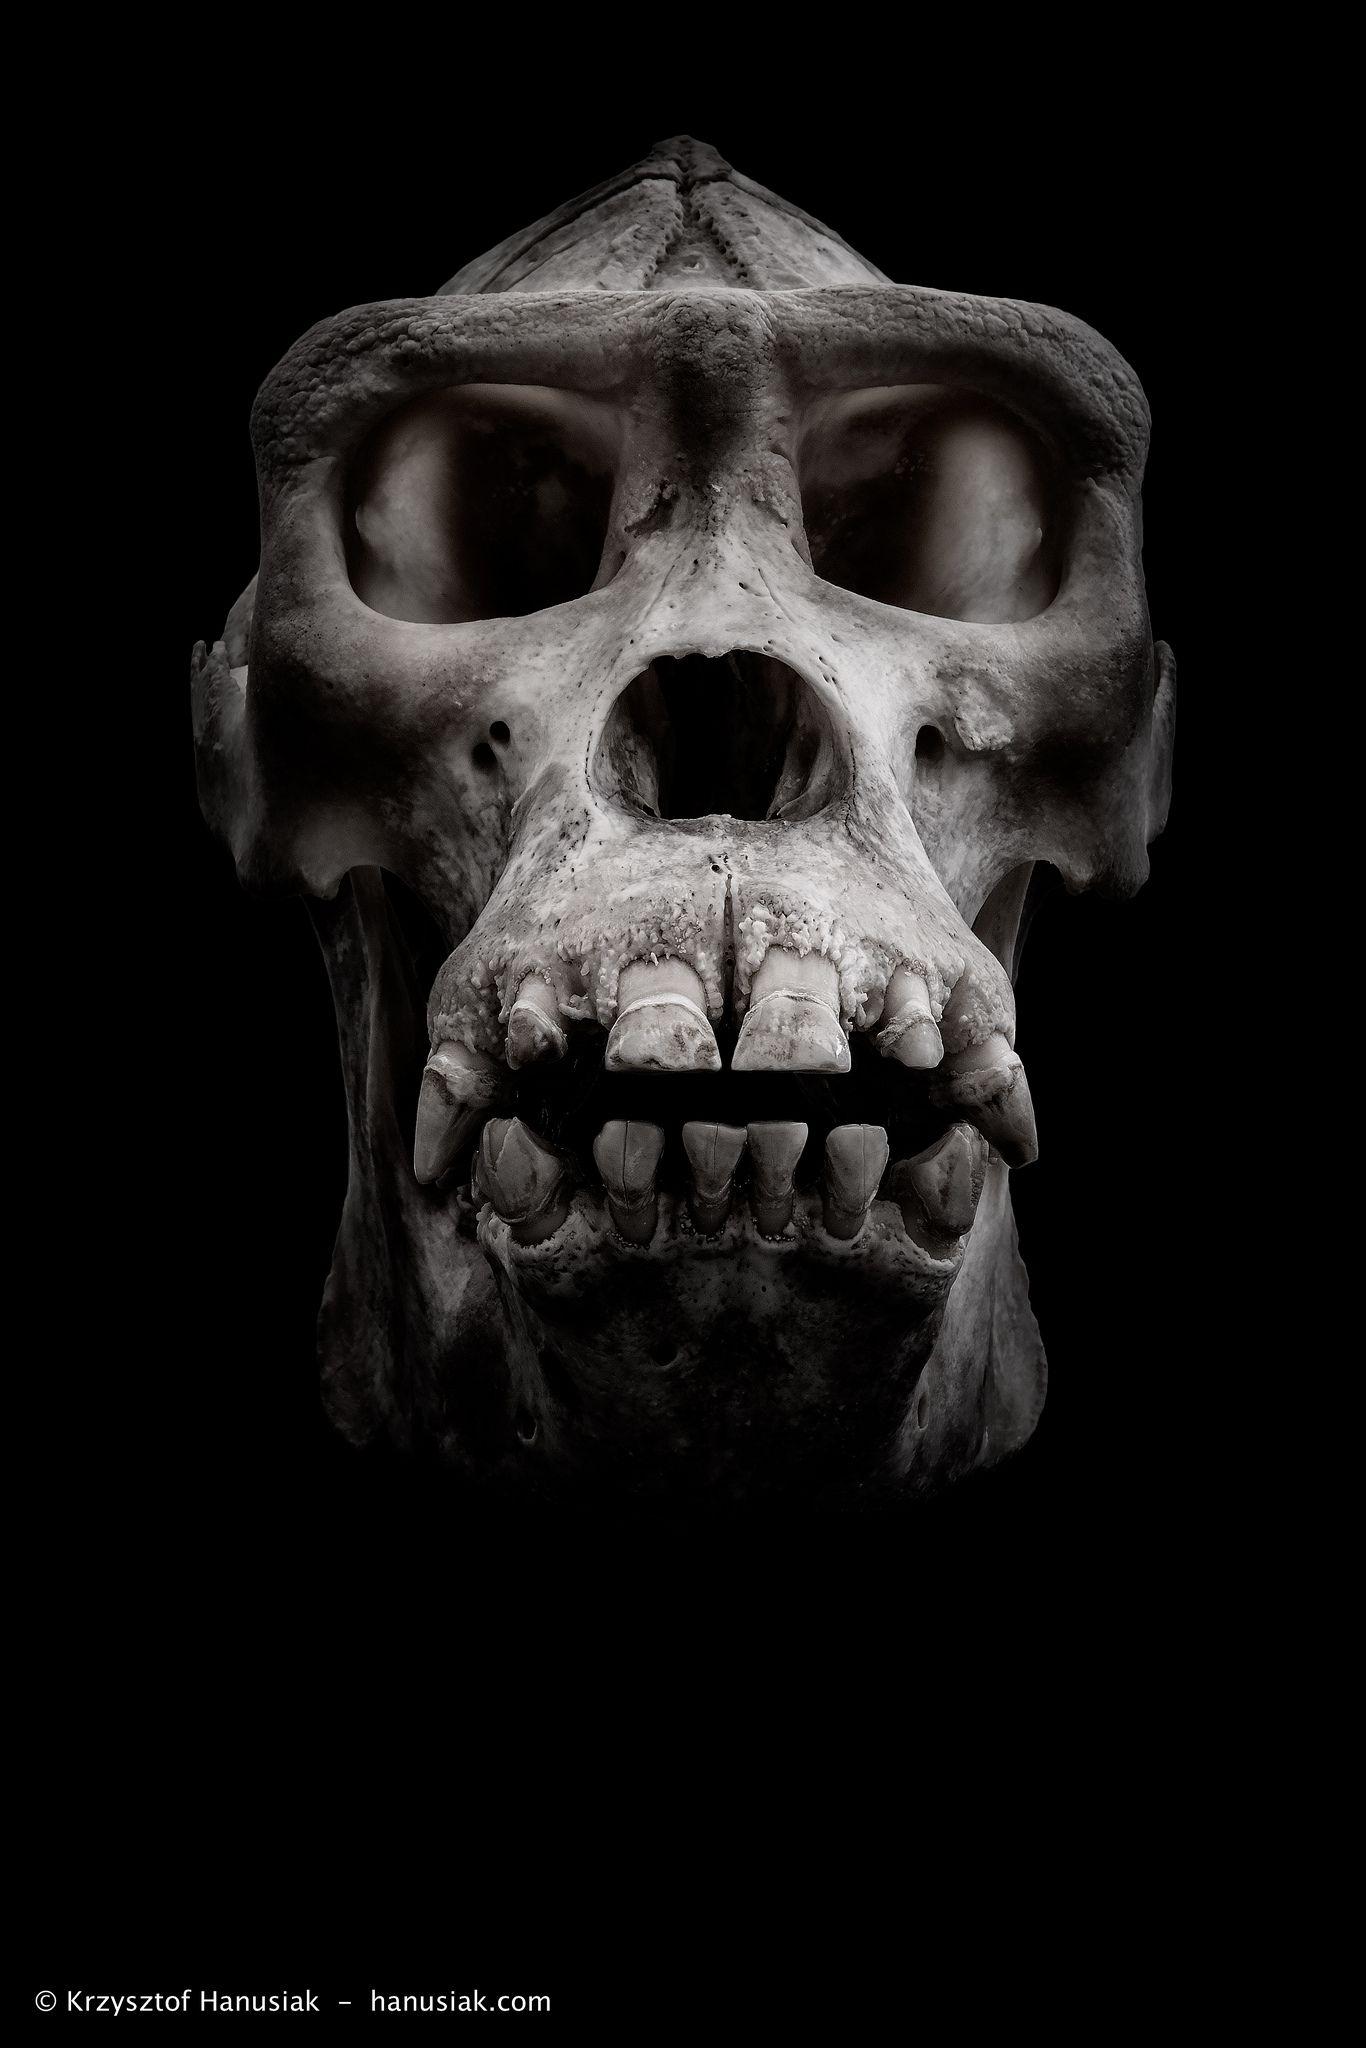 Gorilla Skull | Pinterest | Anatomy, Animal skulls and Animal anatomy